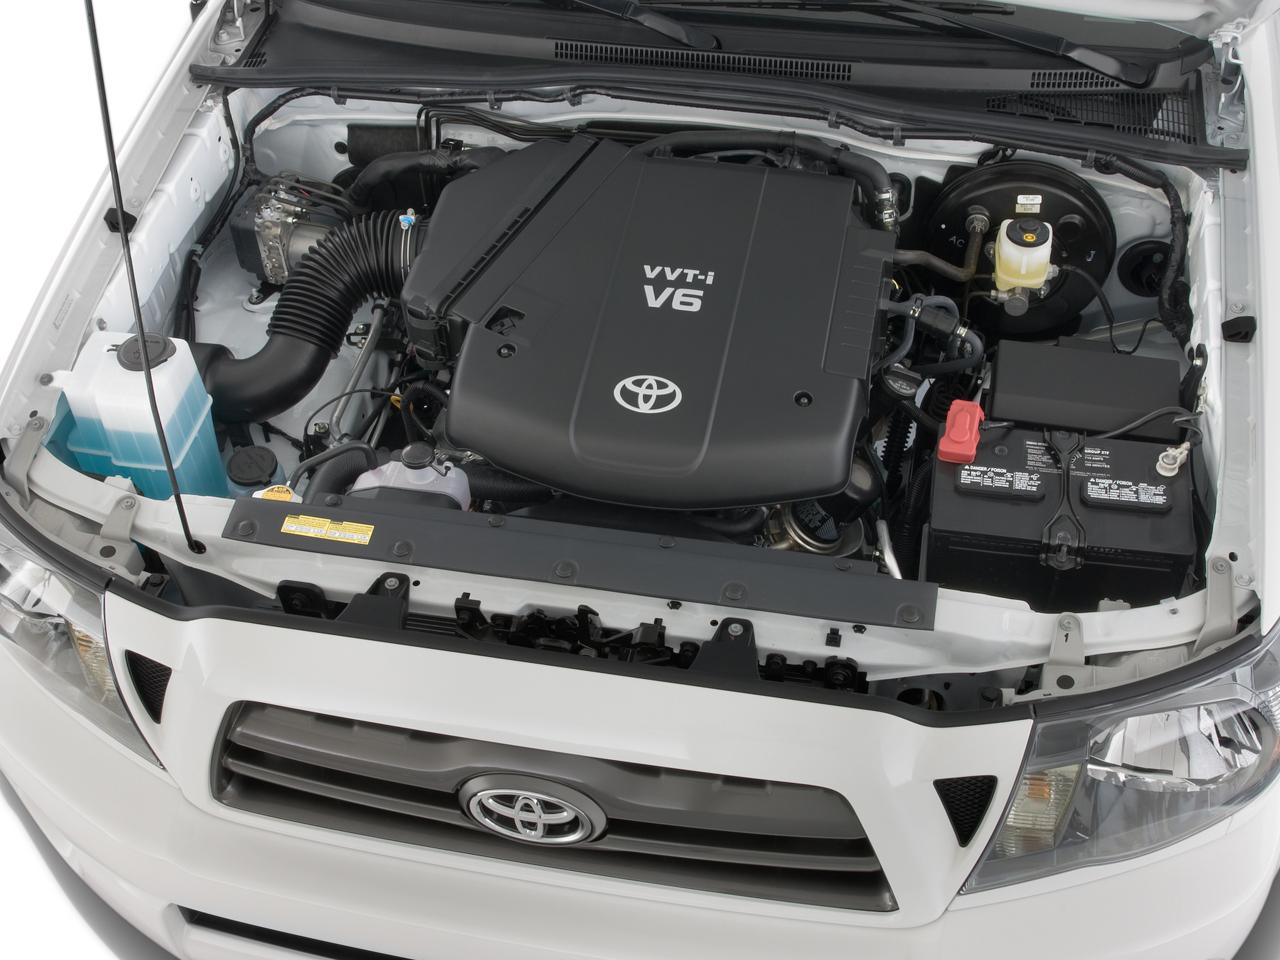 2009 Toyota Tacoma Double Cab 4x4 V-6 SR5 TRD - Toyota ...